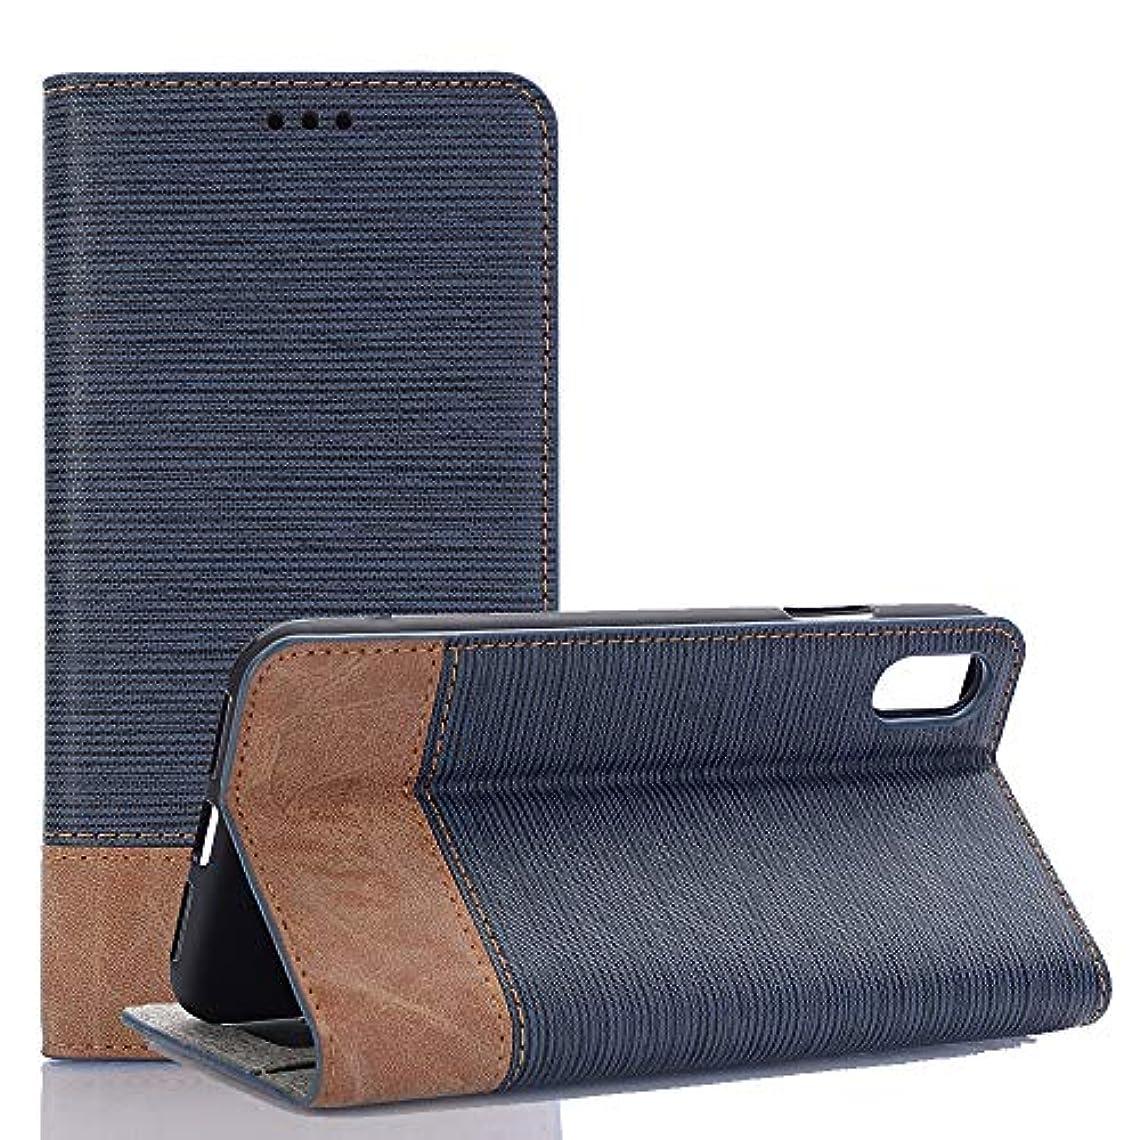 Galaxy S9 ケース、INorton 本革ケース 全面保護 衝撃吸収 スタンド機能 カード収納 手帳型 スマートケース Galaxy S9対応